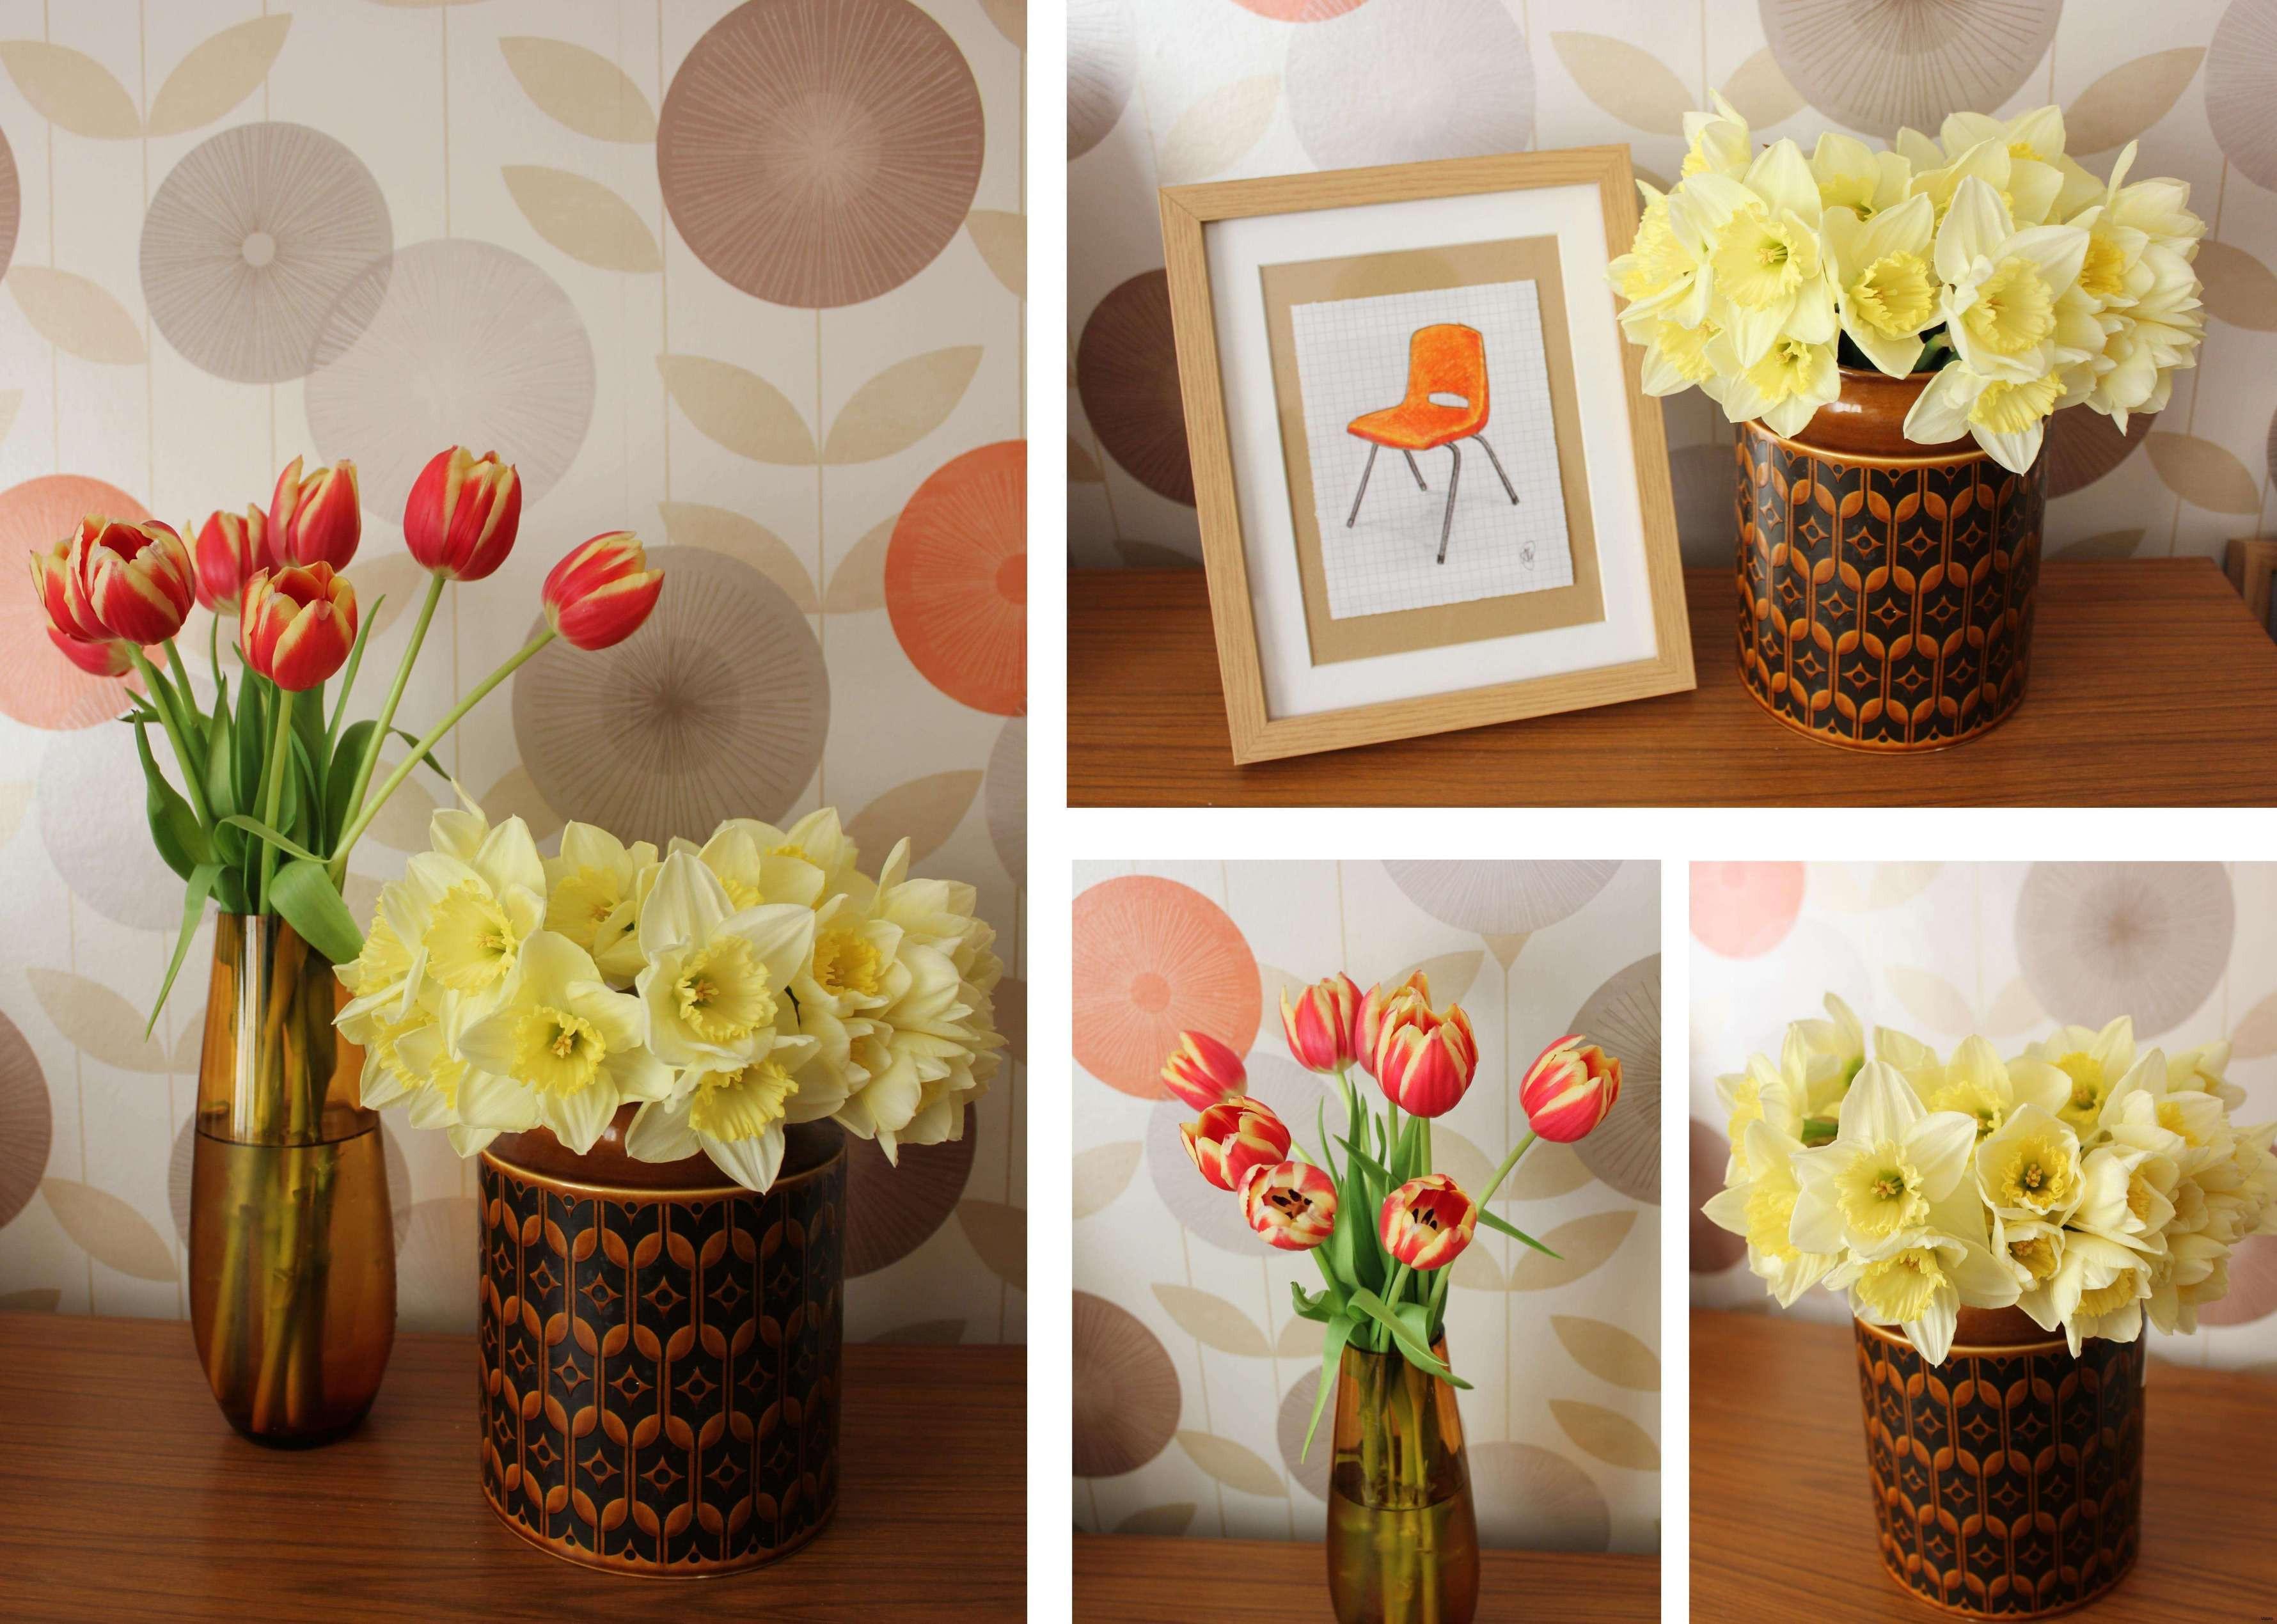 headstone vases of metal vase wall decor pics h vases artificial flower arrangements i pertaining to metal vase wall decor image 17 awesome home wall decorations of metal vase wall decor pics